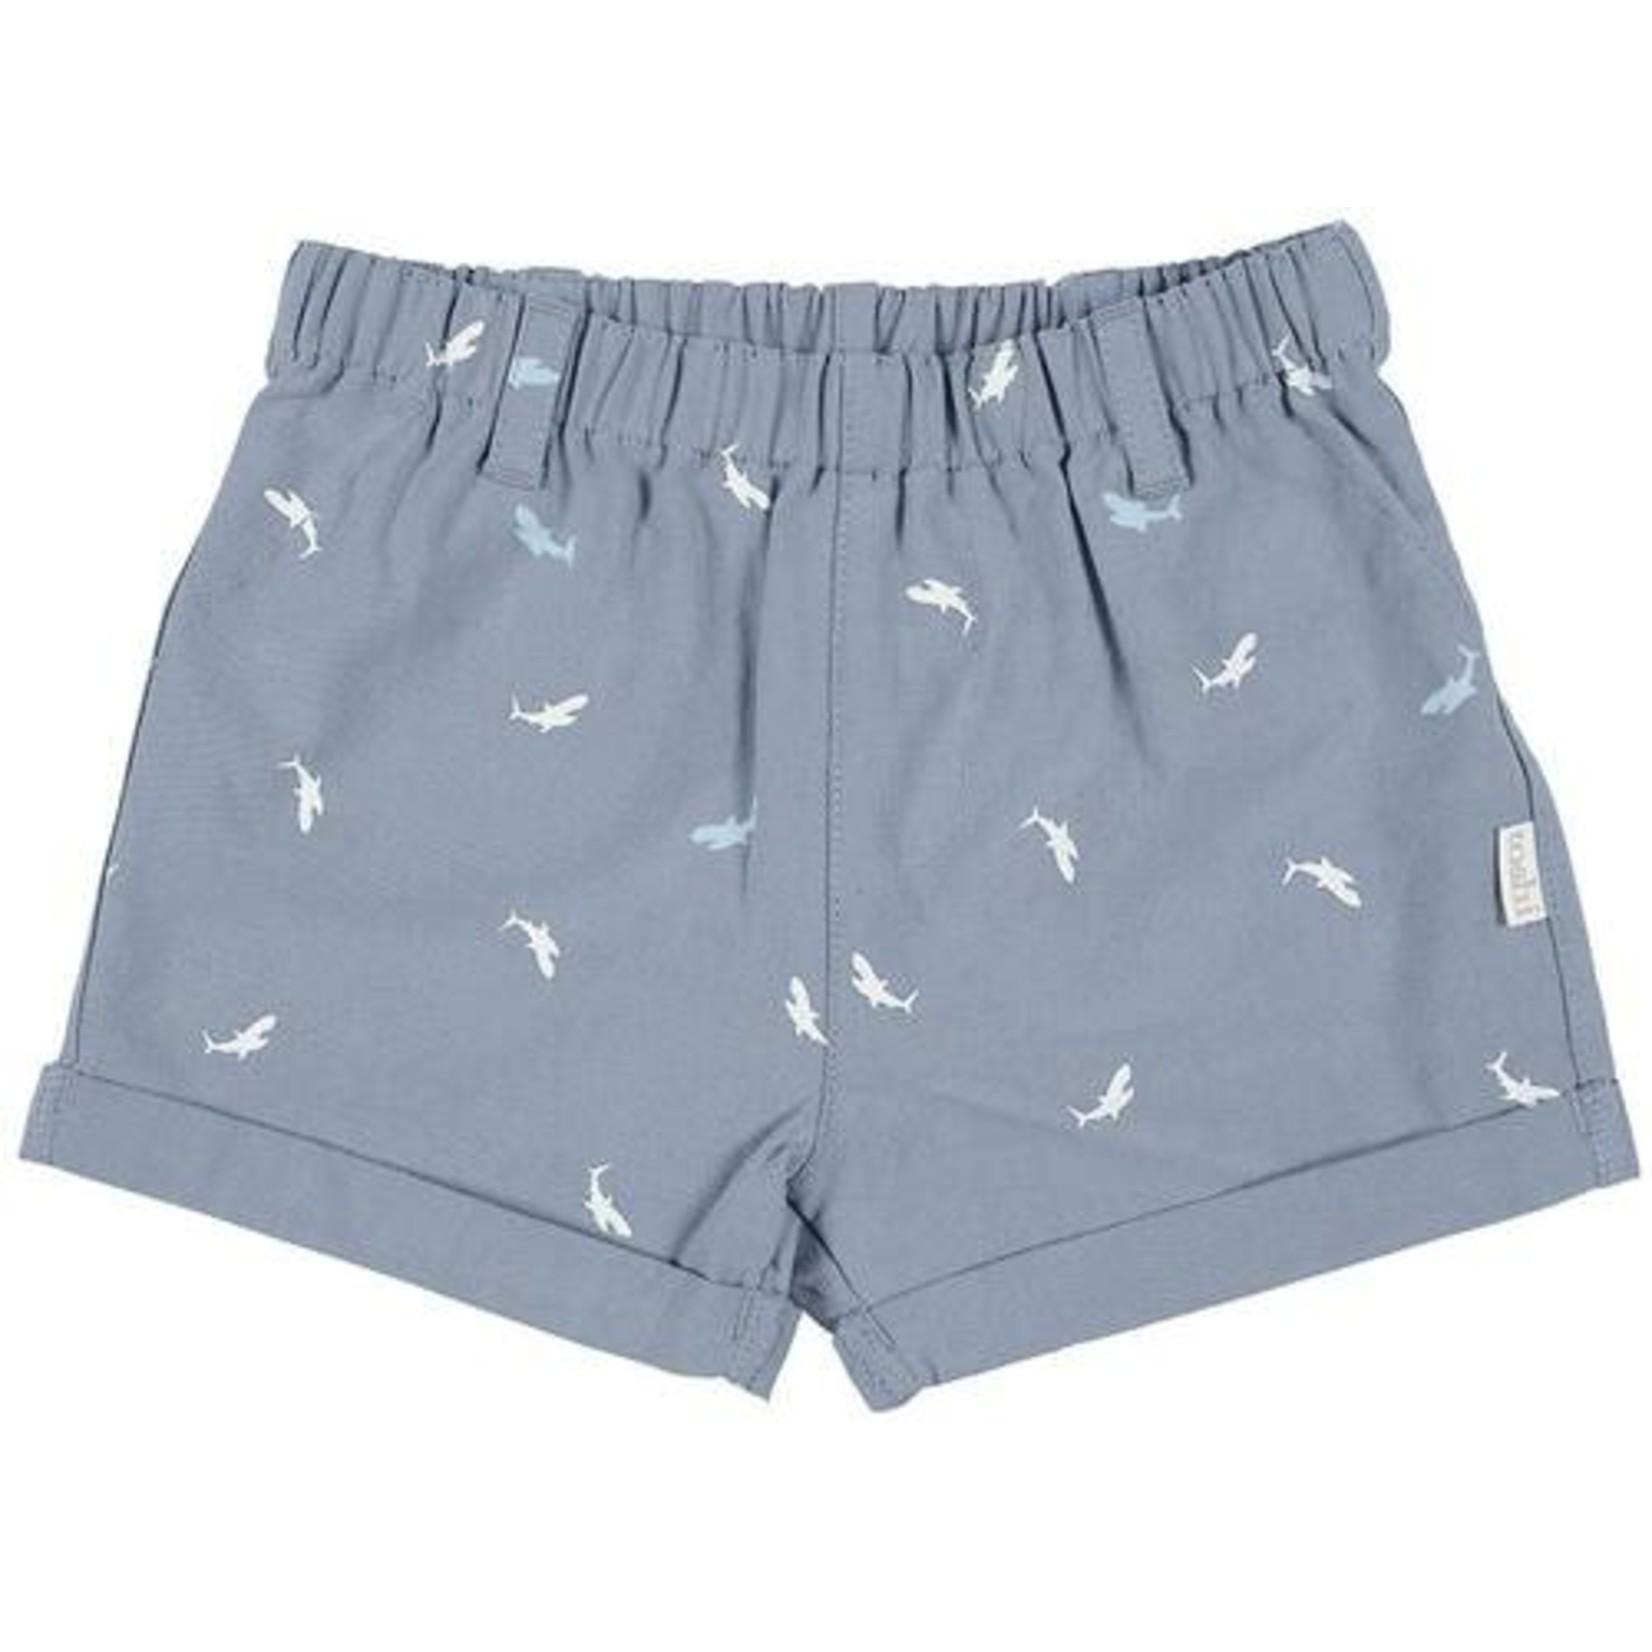 Toshi Toshi Shorts - Sharks